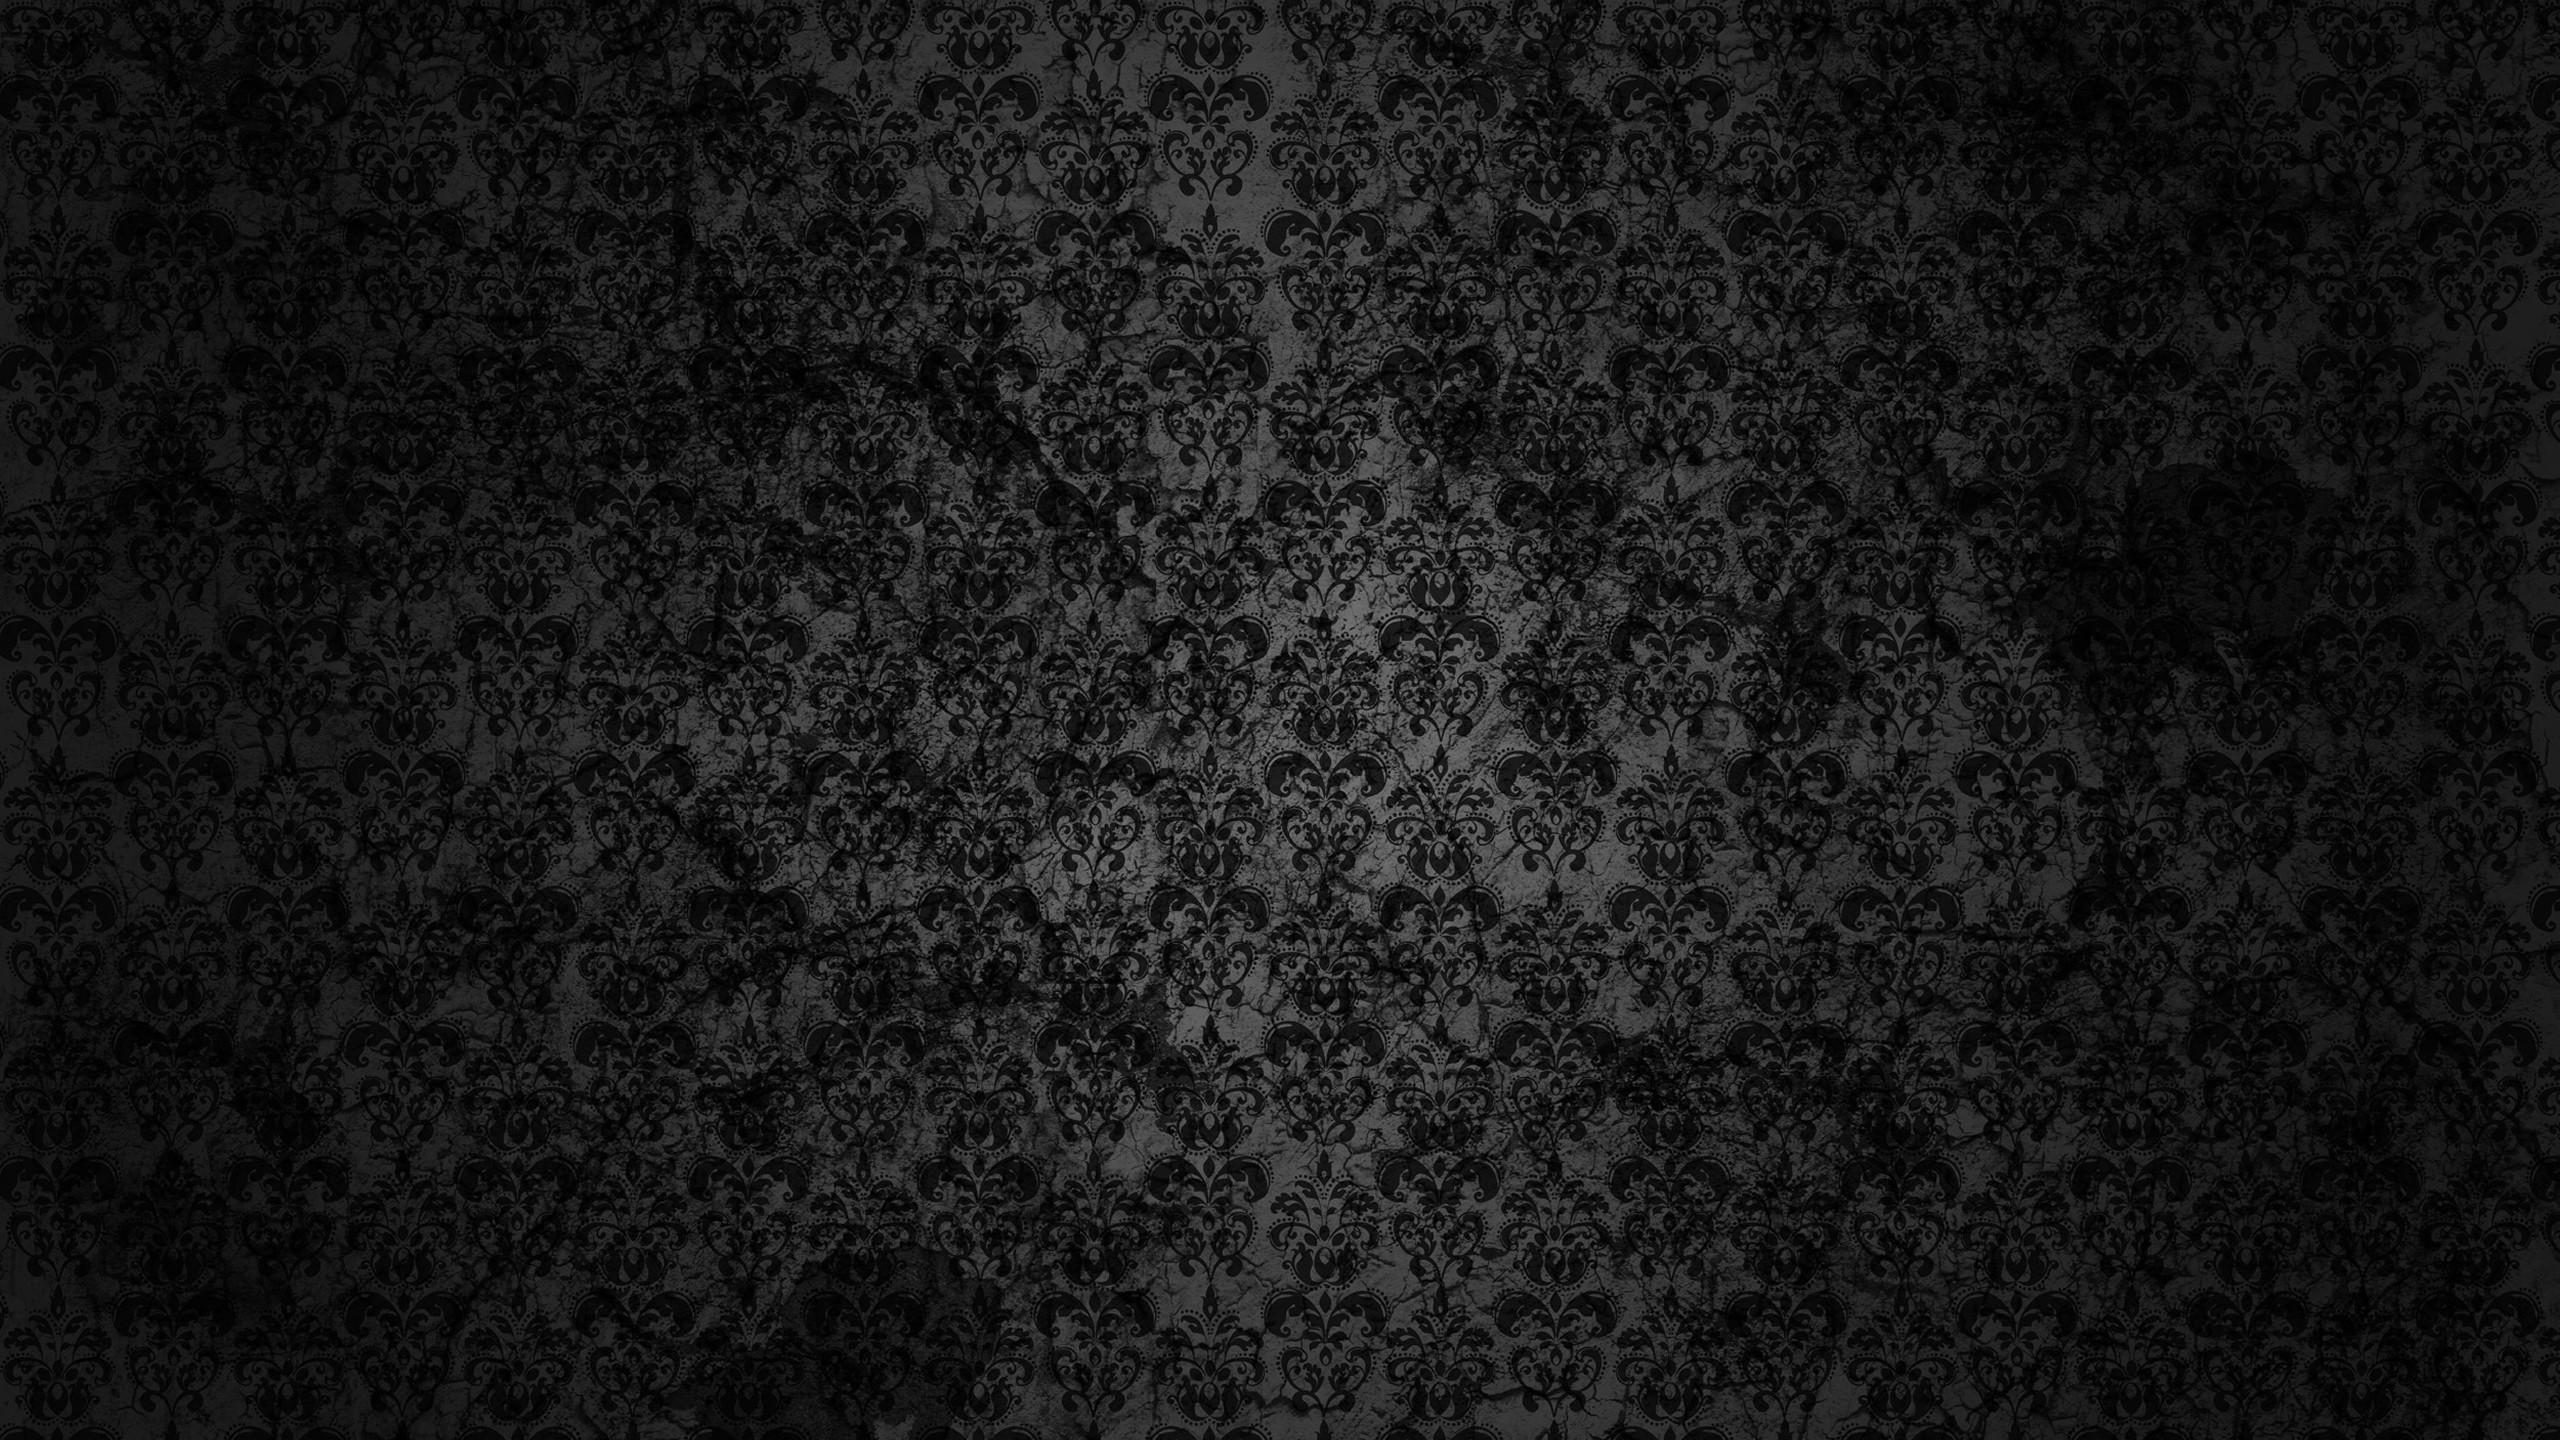 imvu profile background